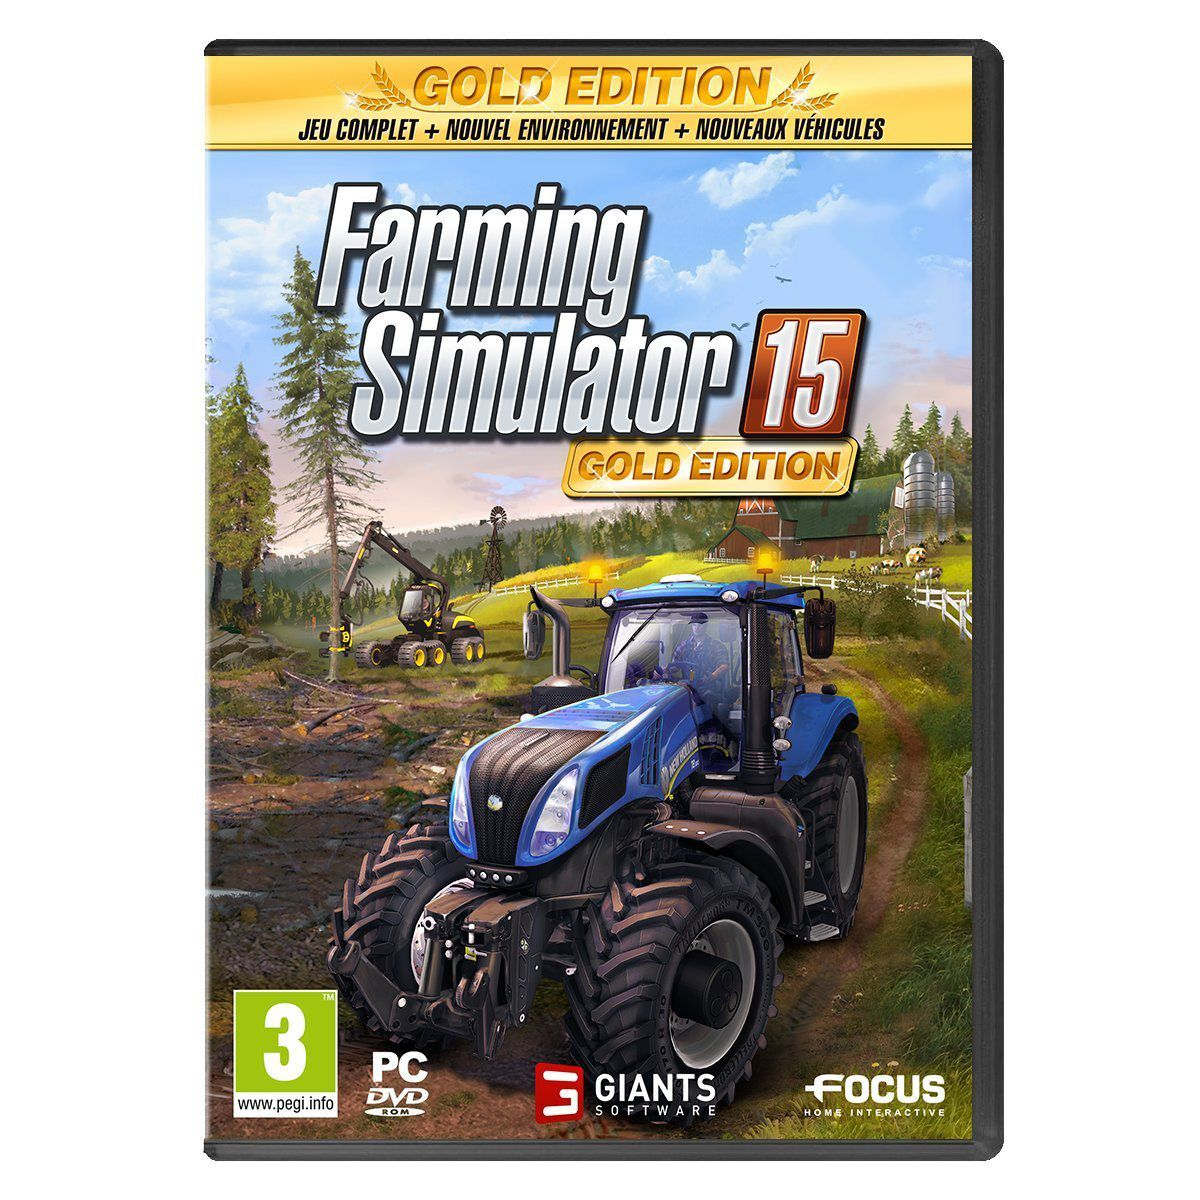 Jeu pc focus farming simulator 15 gold edition - 3% de remise immédiate avec le code : multi3 (photo)